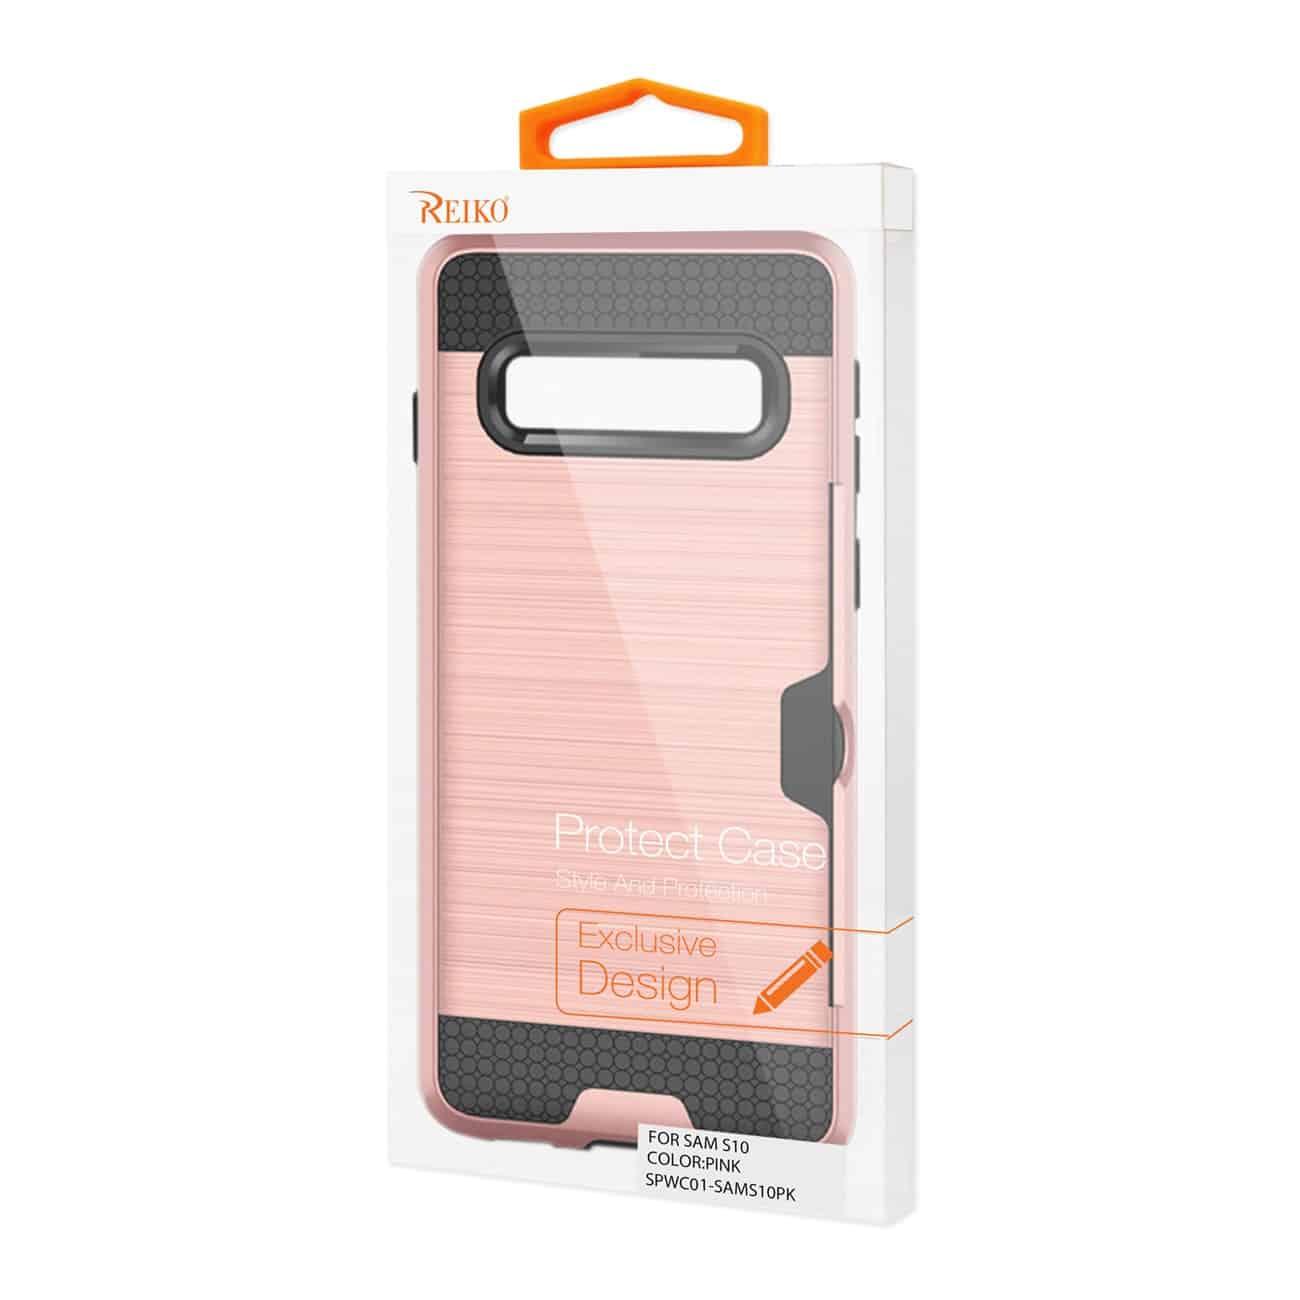 SAMSUNG GALAXY S10 Slim Armor Hybrid Case With Card Holder In Pink